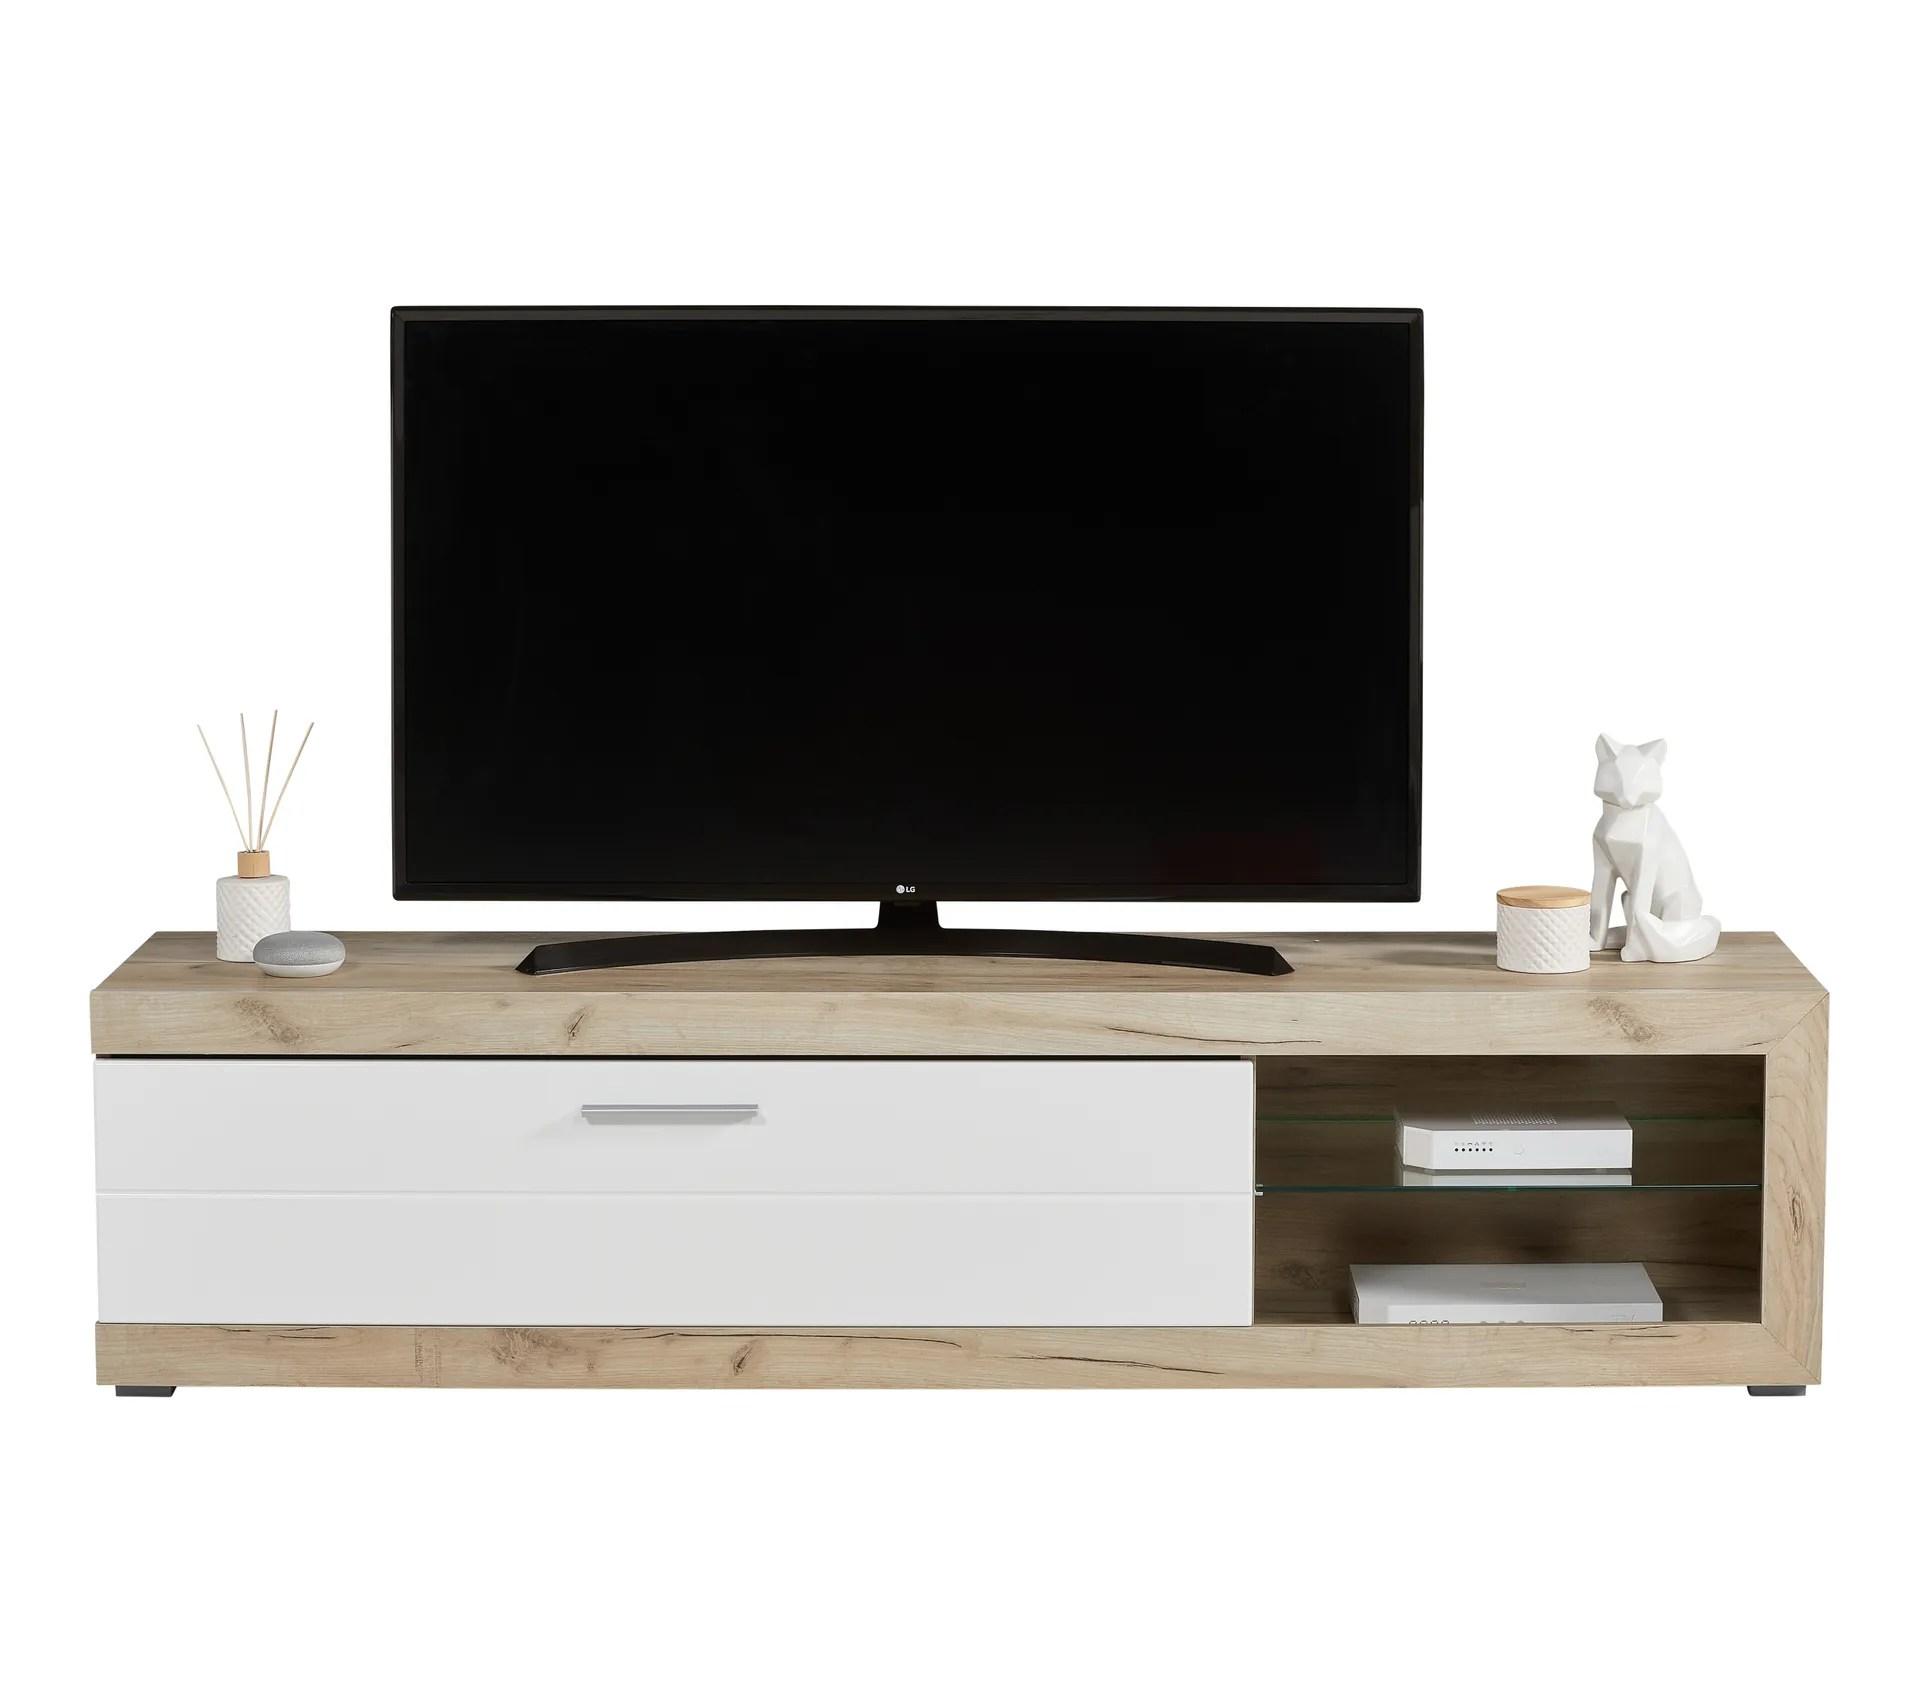 long meuble tv l 181 remo imitation chene gris blanc